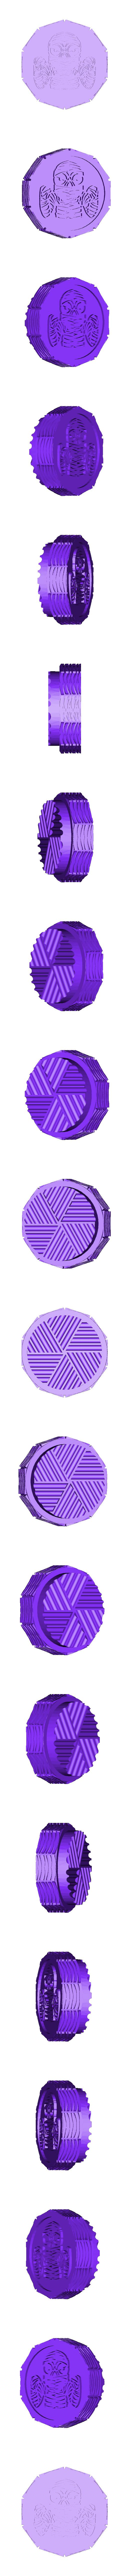 Momia superior patrón.STL Télécharger fichier STL BROYEUR D'HERBE - DIY - MOMIE HALLOWEEN • Objet à imprimer en 3D, SnakeCreations